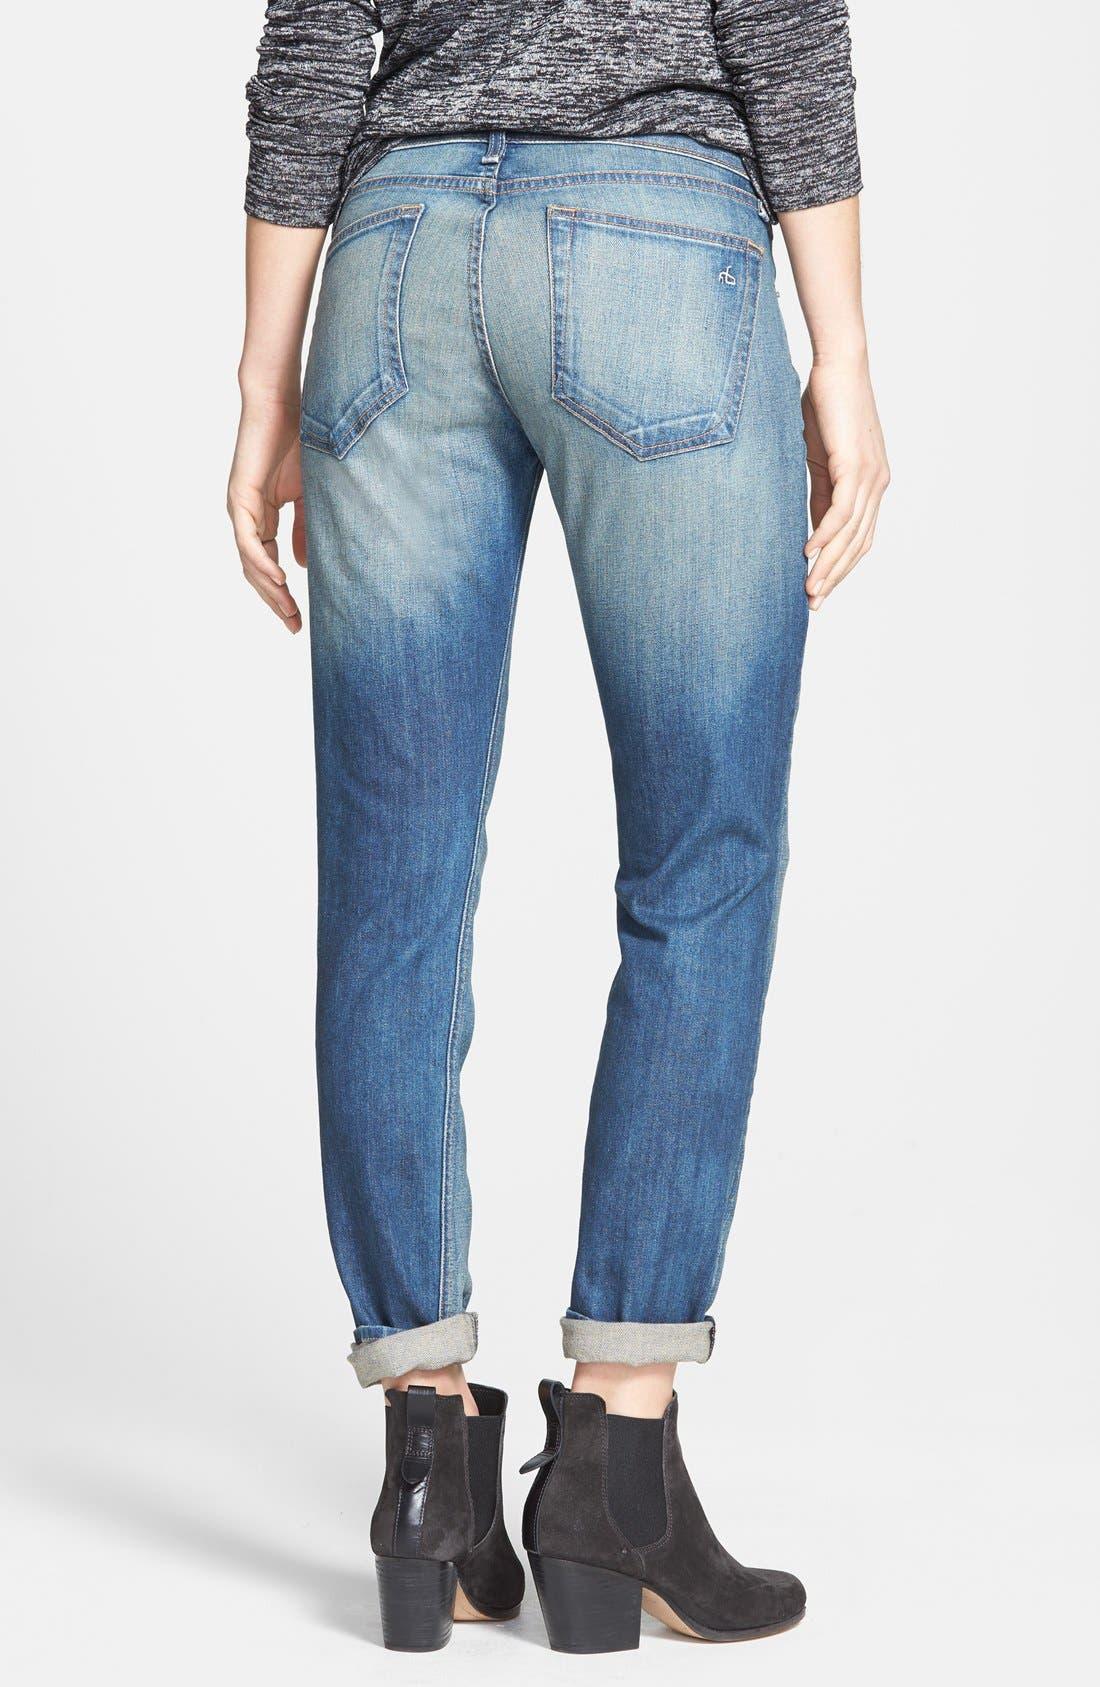 Alternate Image 2  - rag & bone/JEAN 'The Dre' Slim Fit Boyfriend Jeans (Golden) (Nordstrom Exclusive)